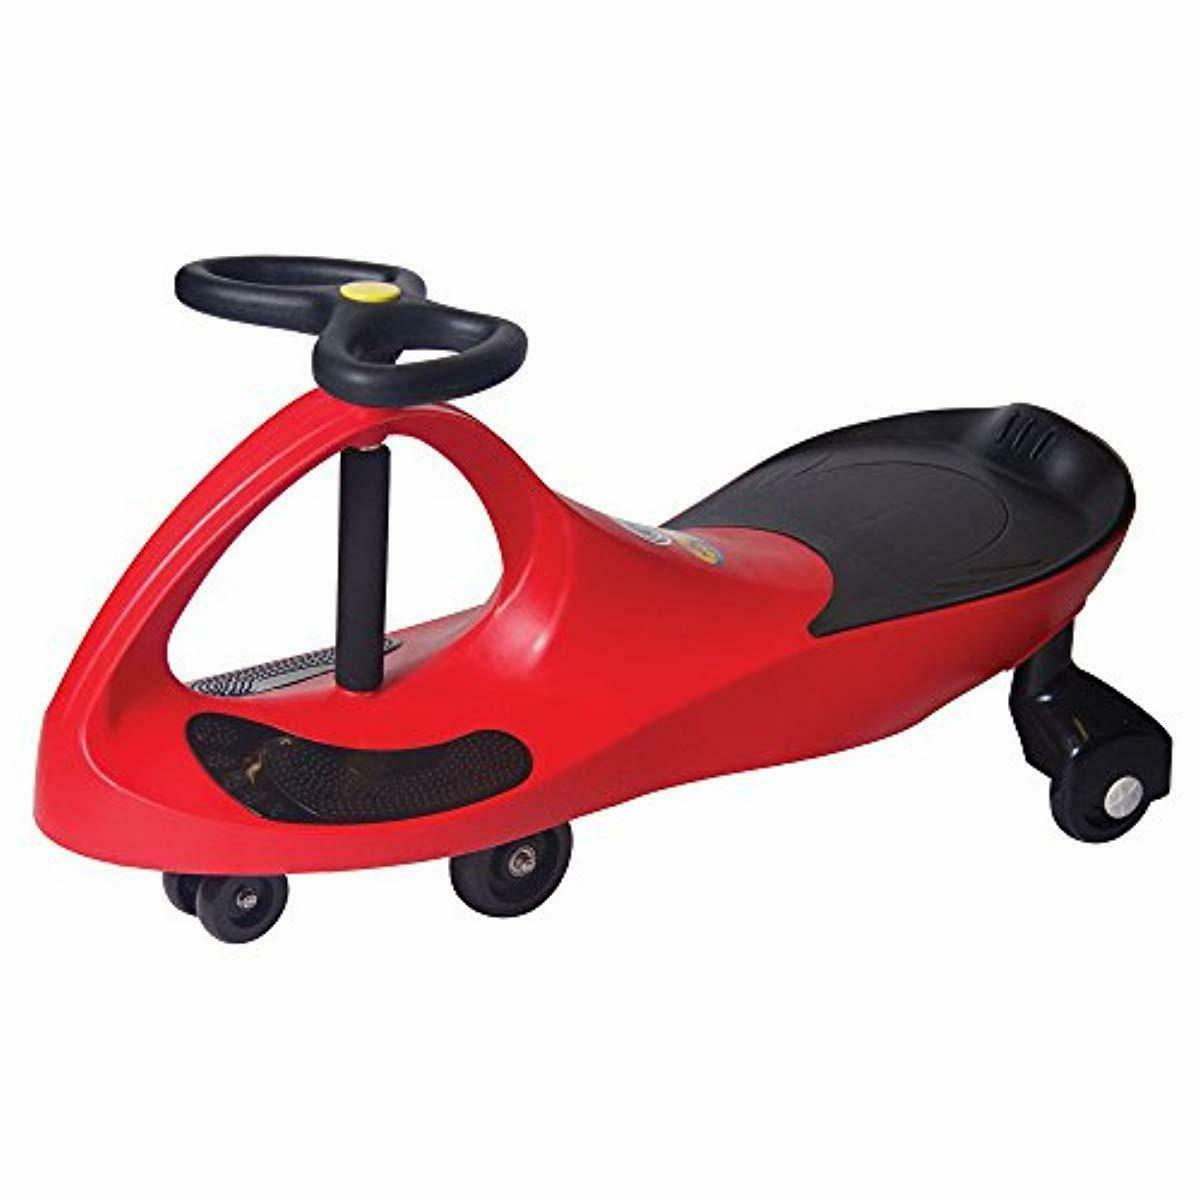 plasmacar red inertia driven ride